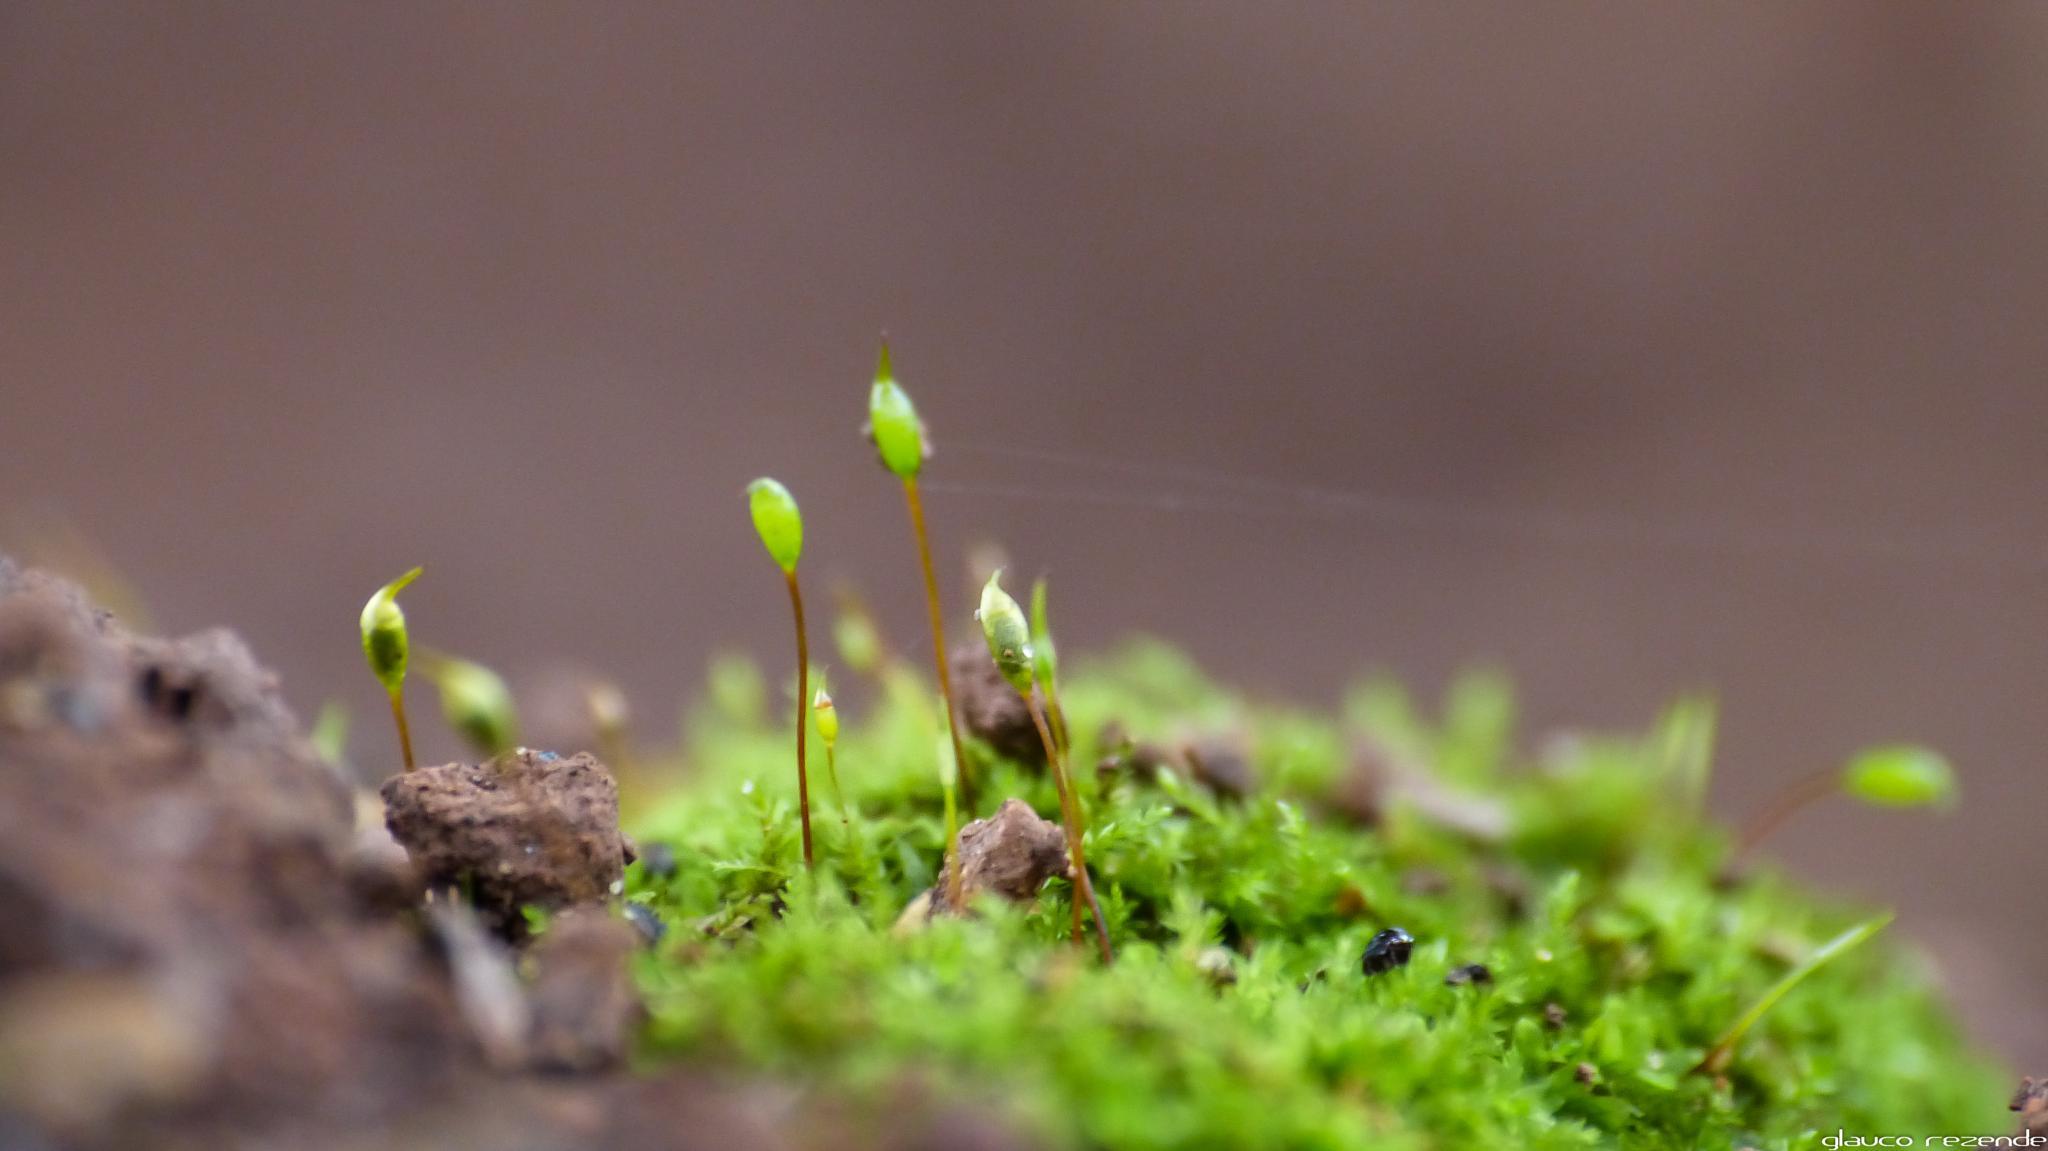 Micro garden by Glauco Rezende